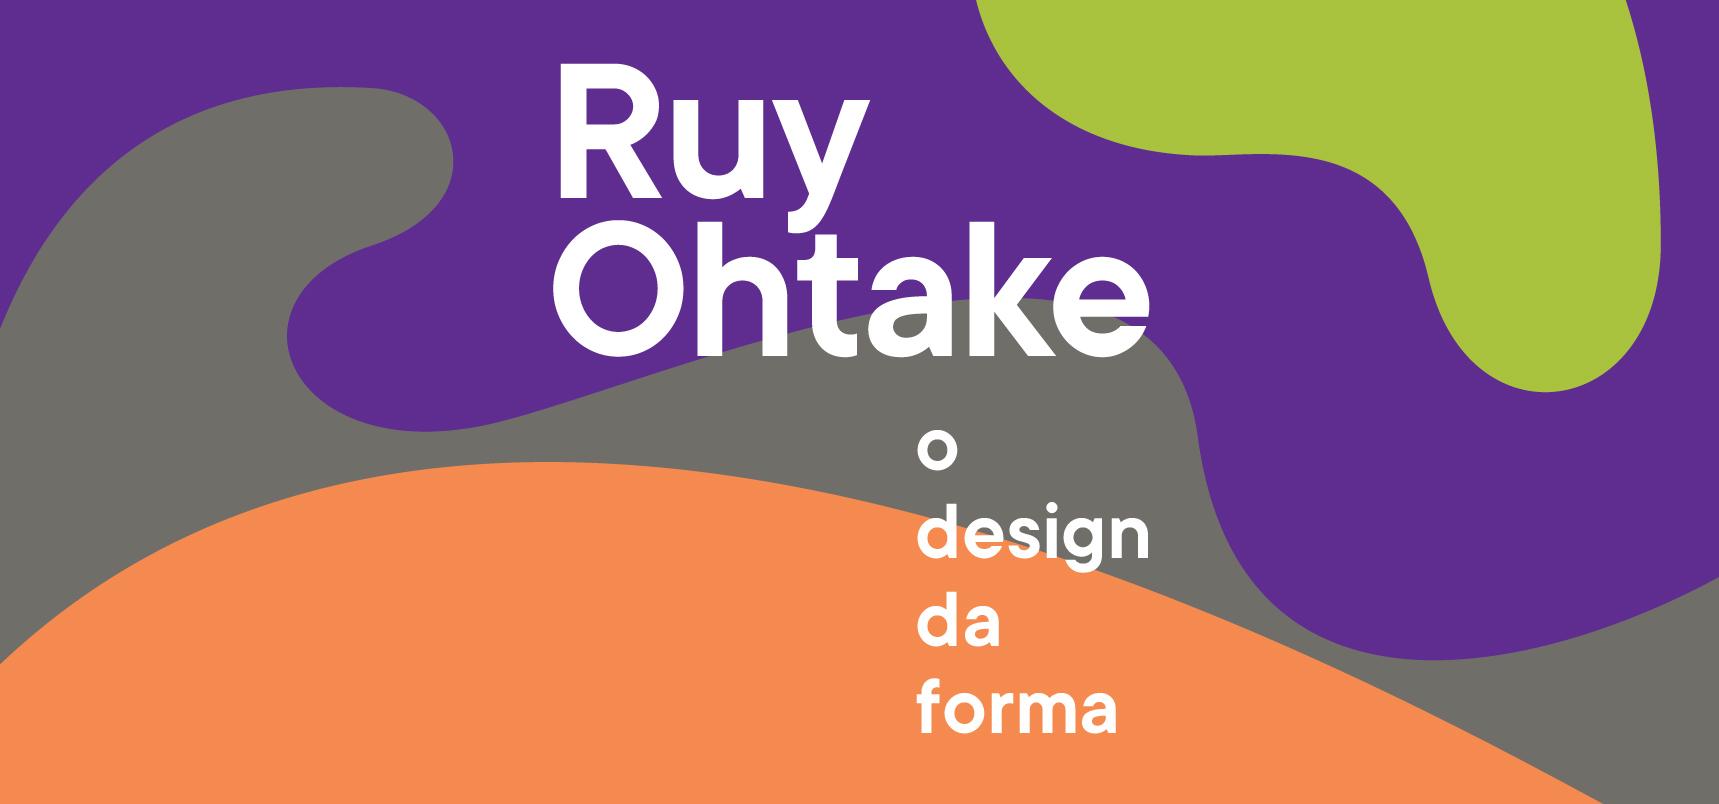 Ruy Ohtake : O design da forma